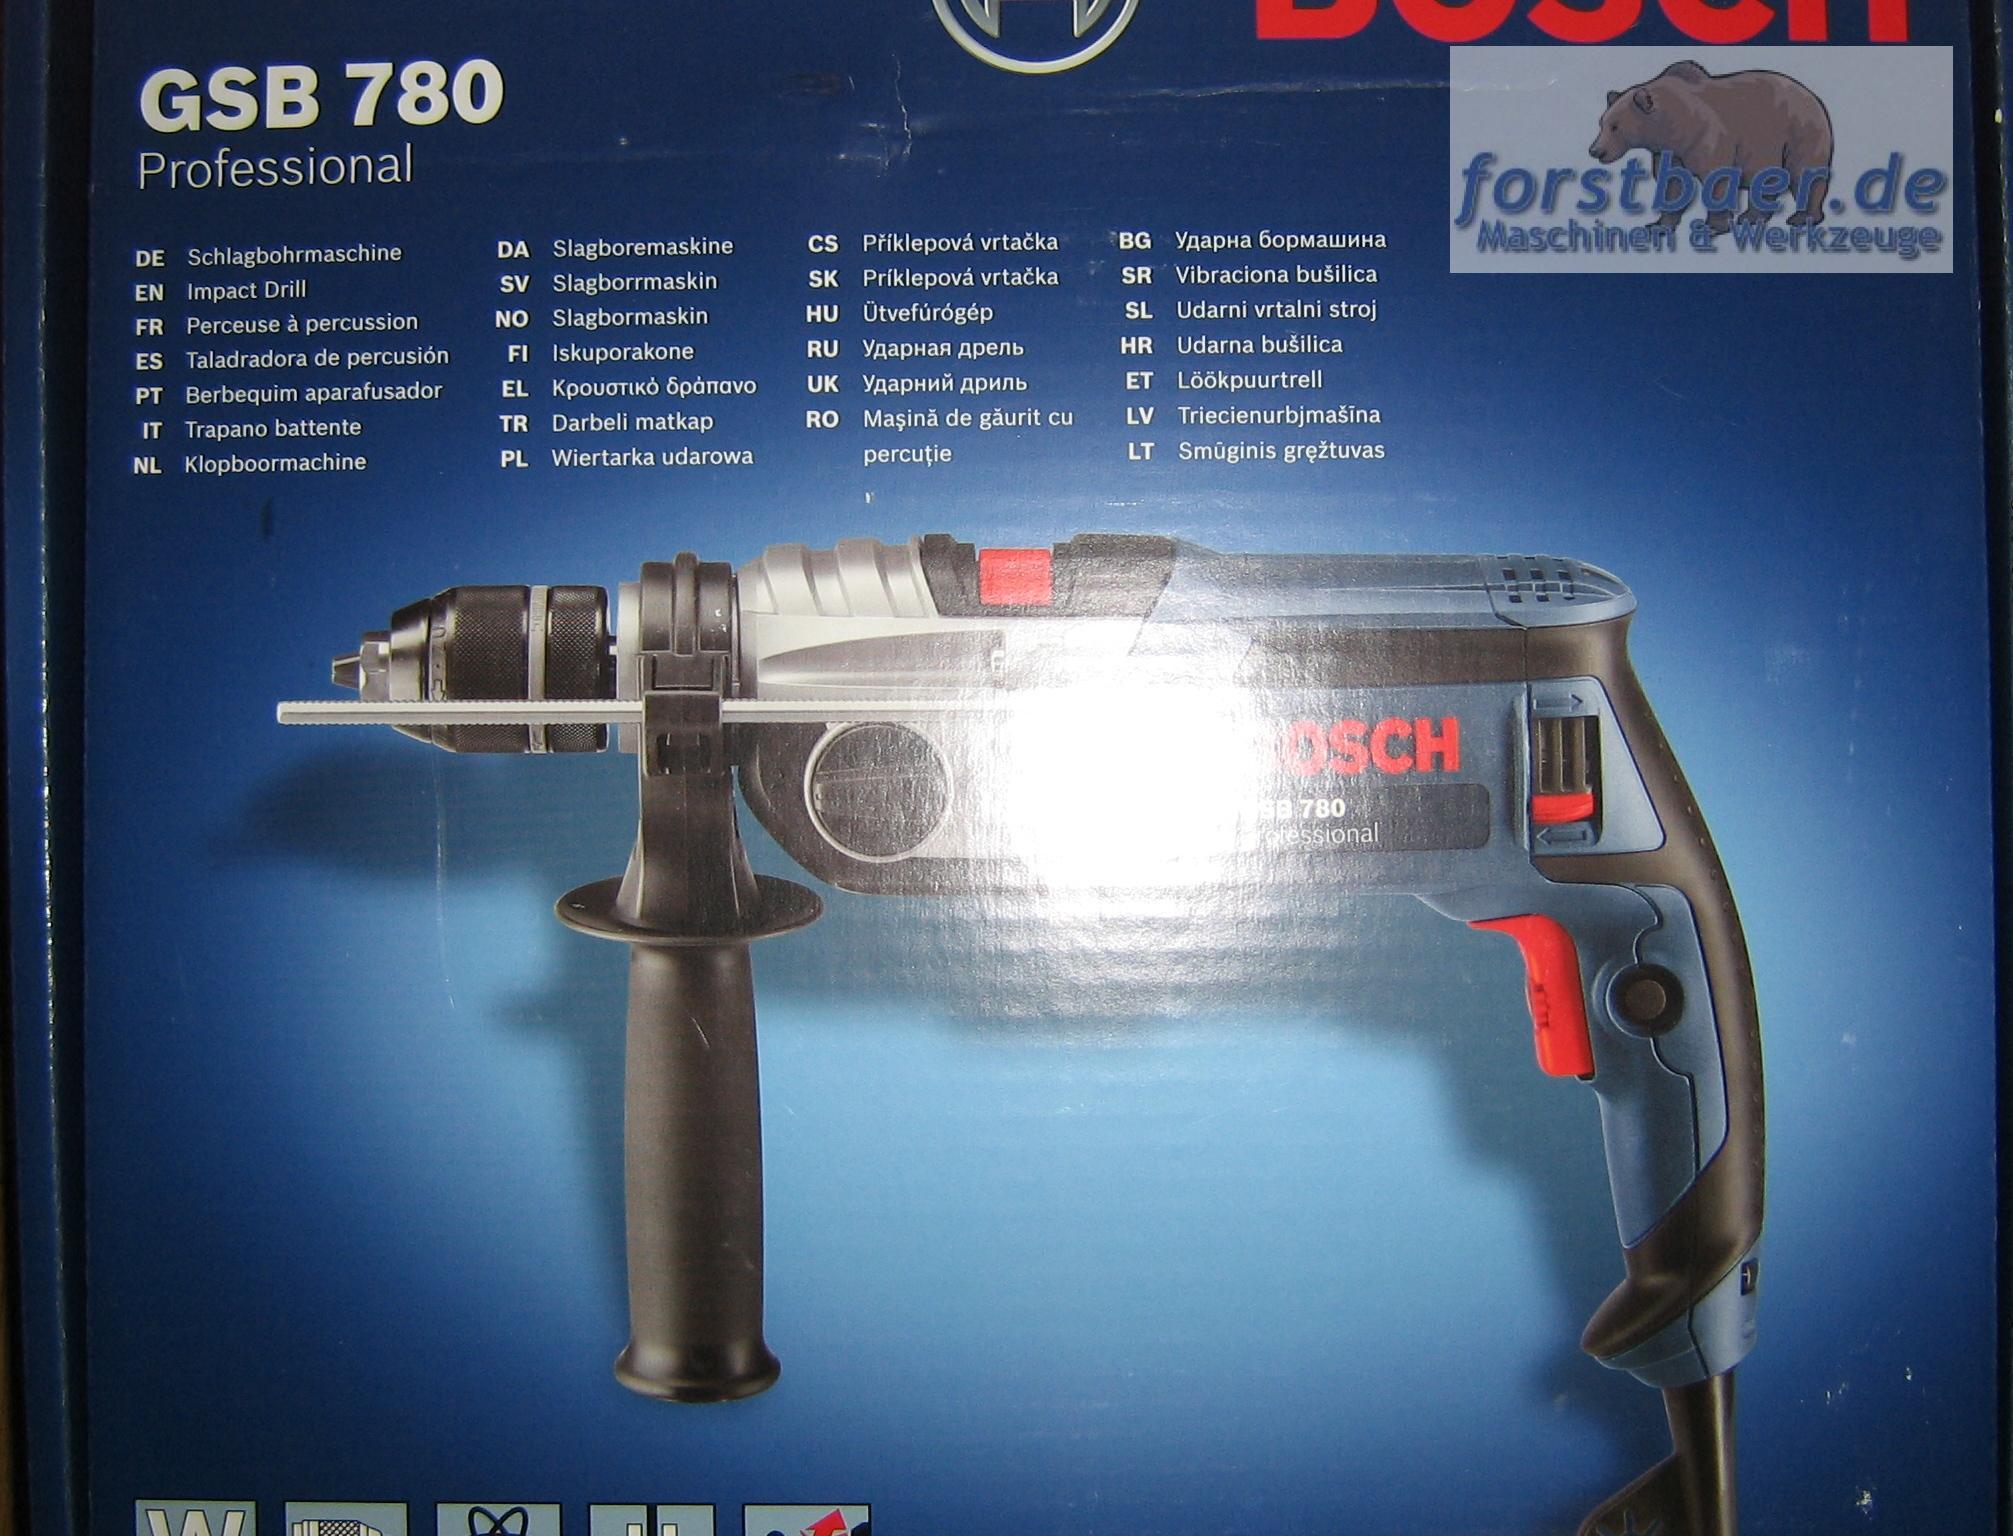 bosch gsb 780 professional schlag bohrmaschine ebay. Black Bedroom Furniture Sets. Home Design Ideas